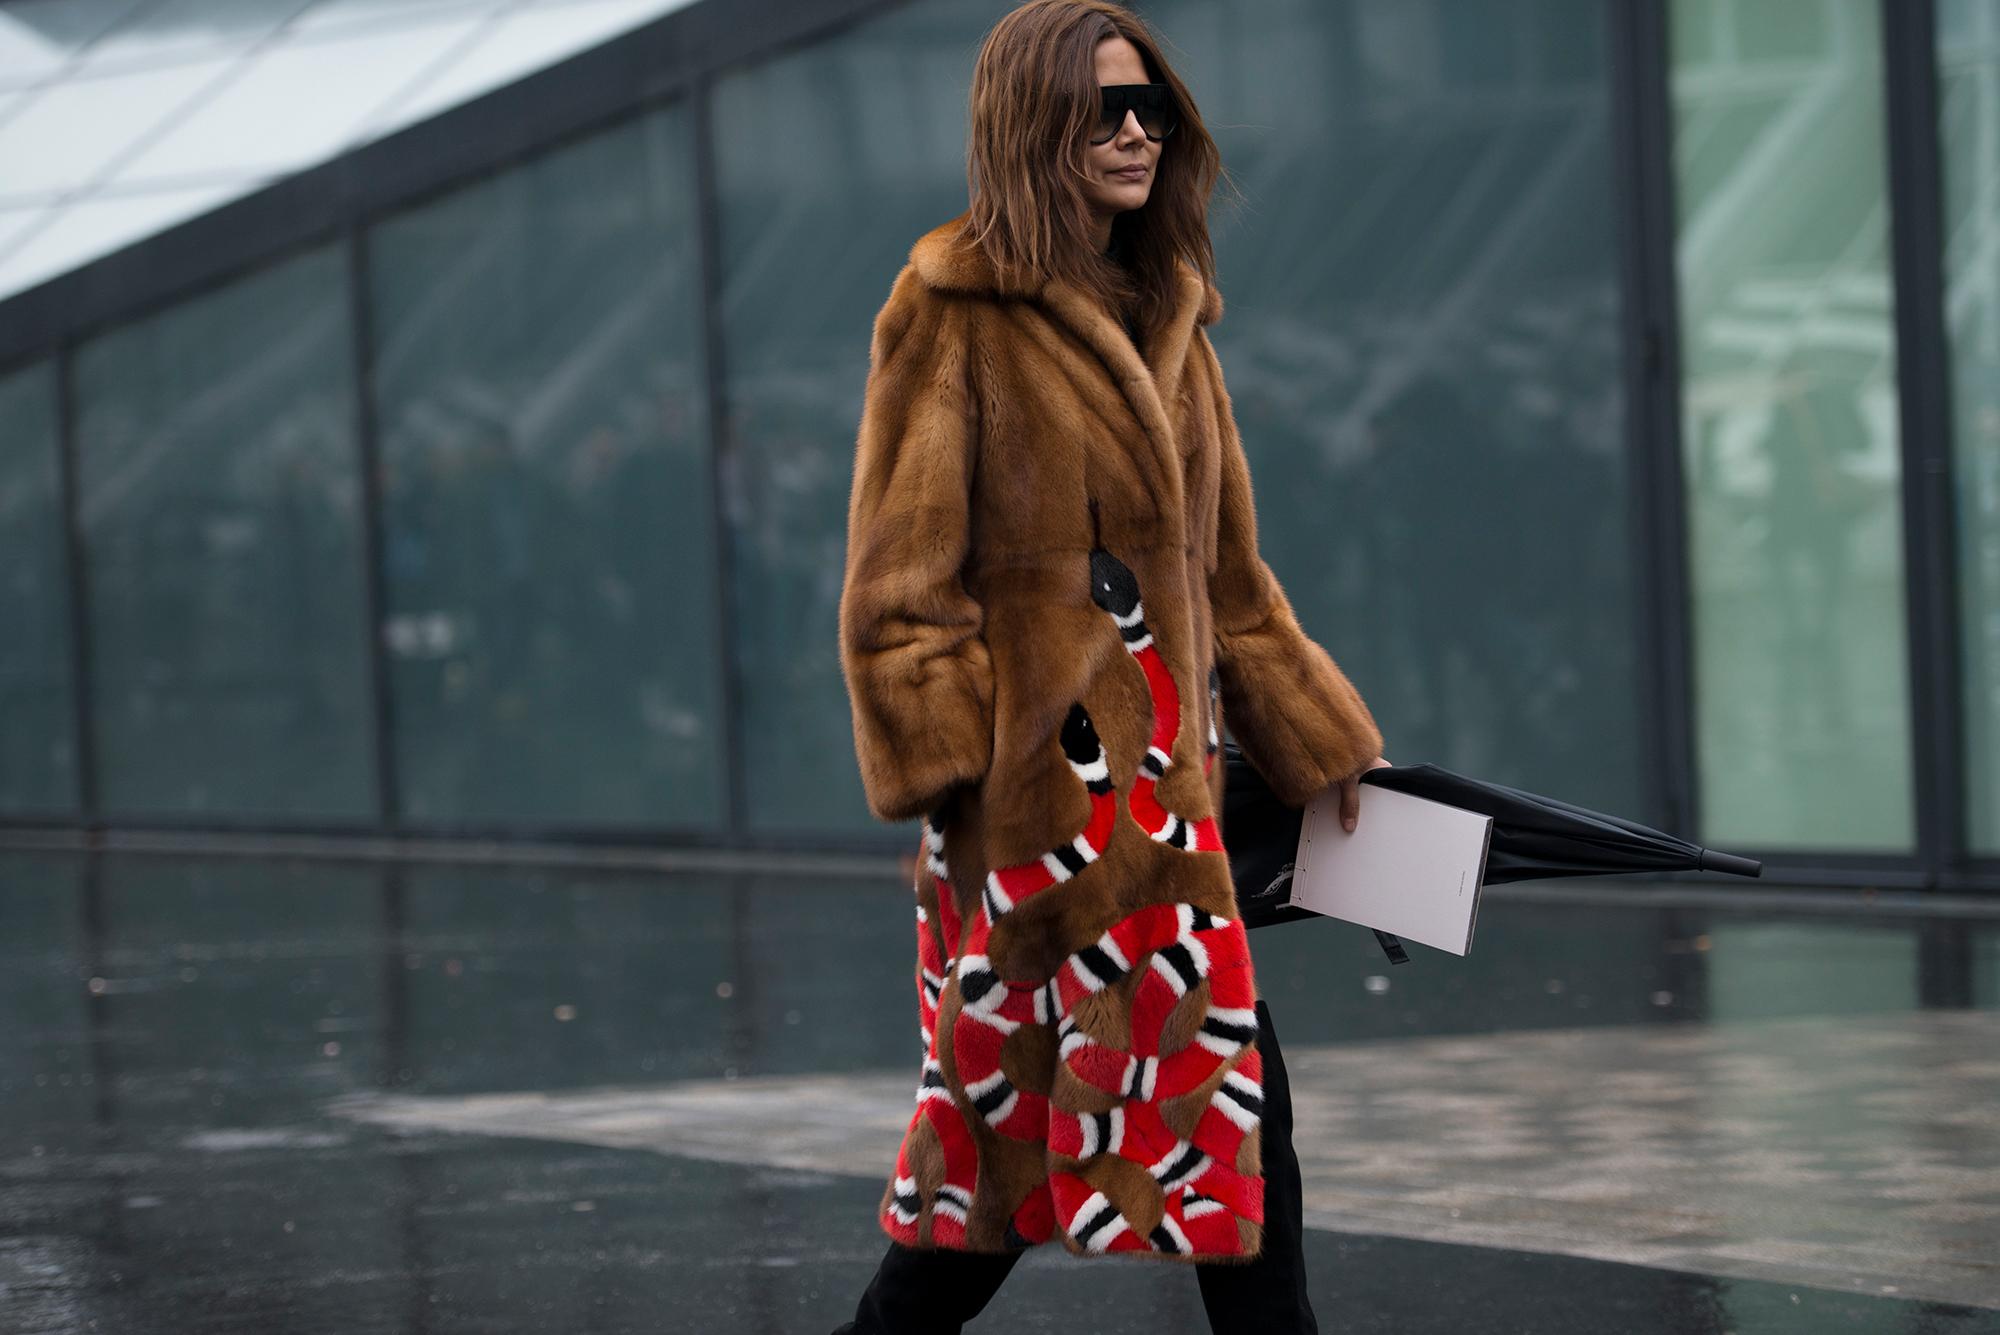 Streetsnaps Paris Fashion Week March 2017 Part 1 Hypebeast - 3743993